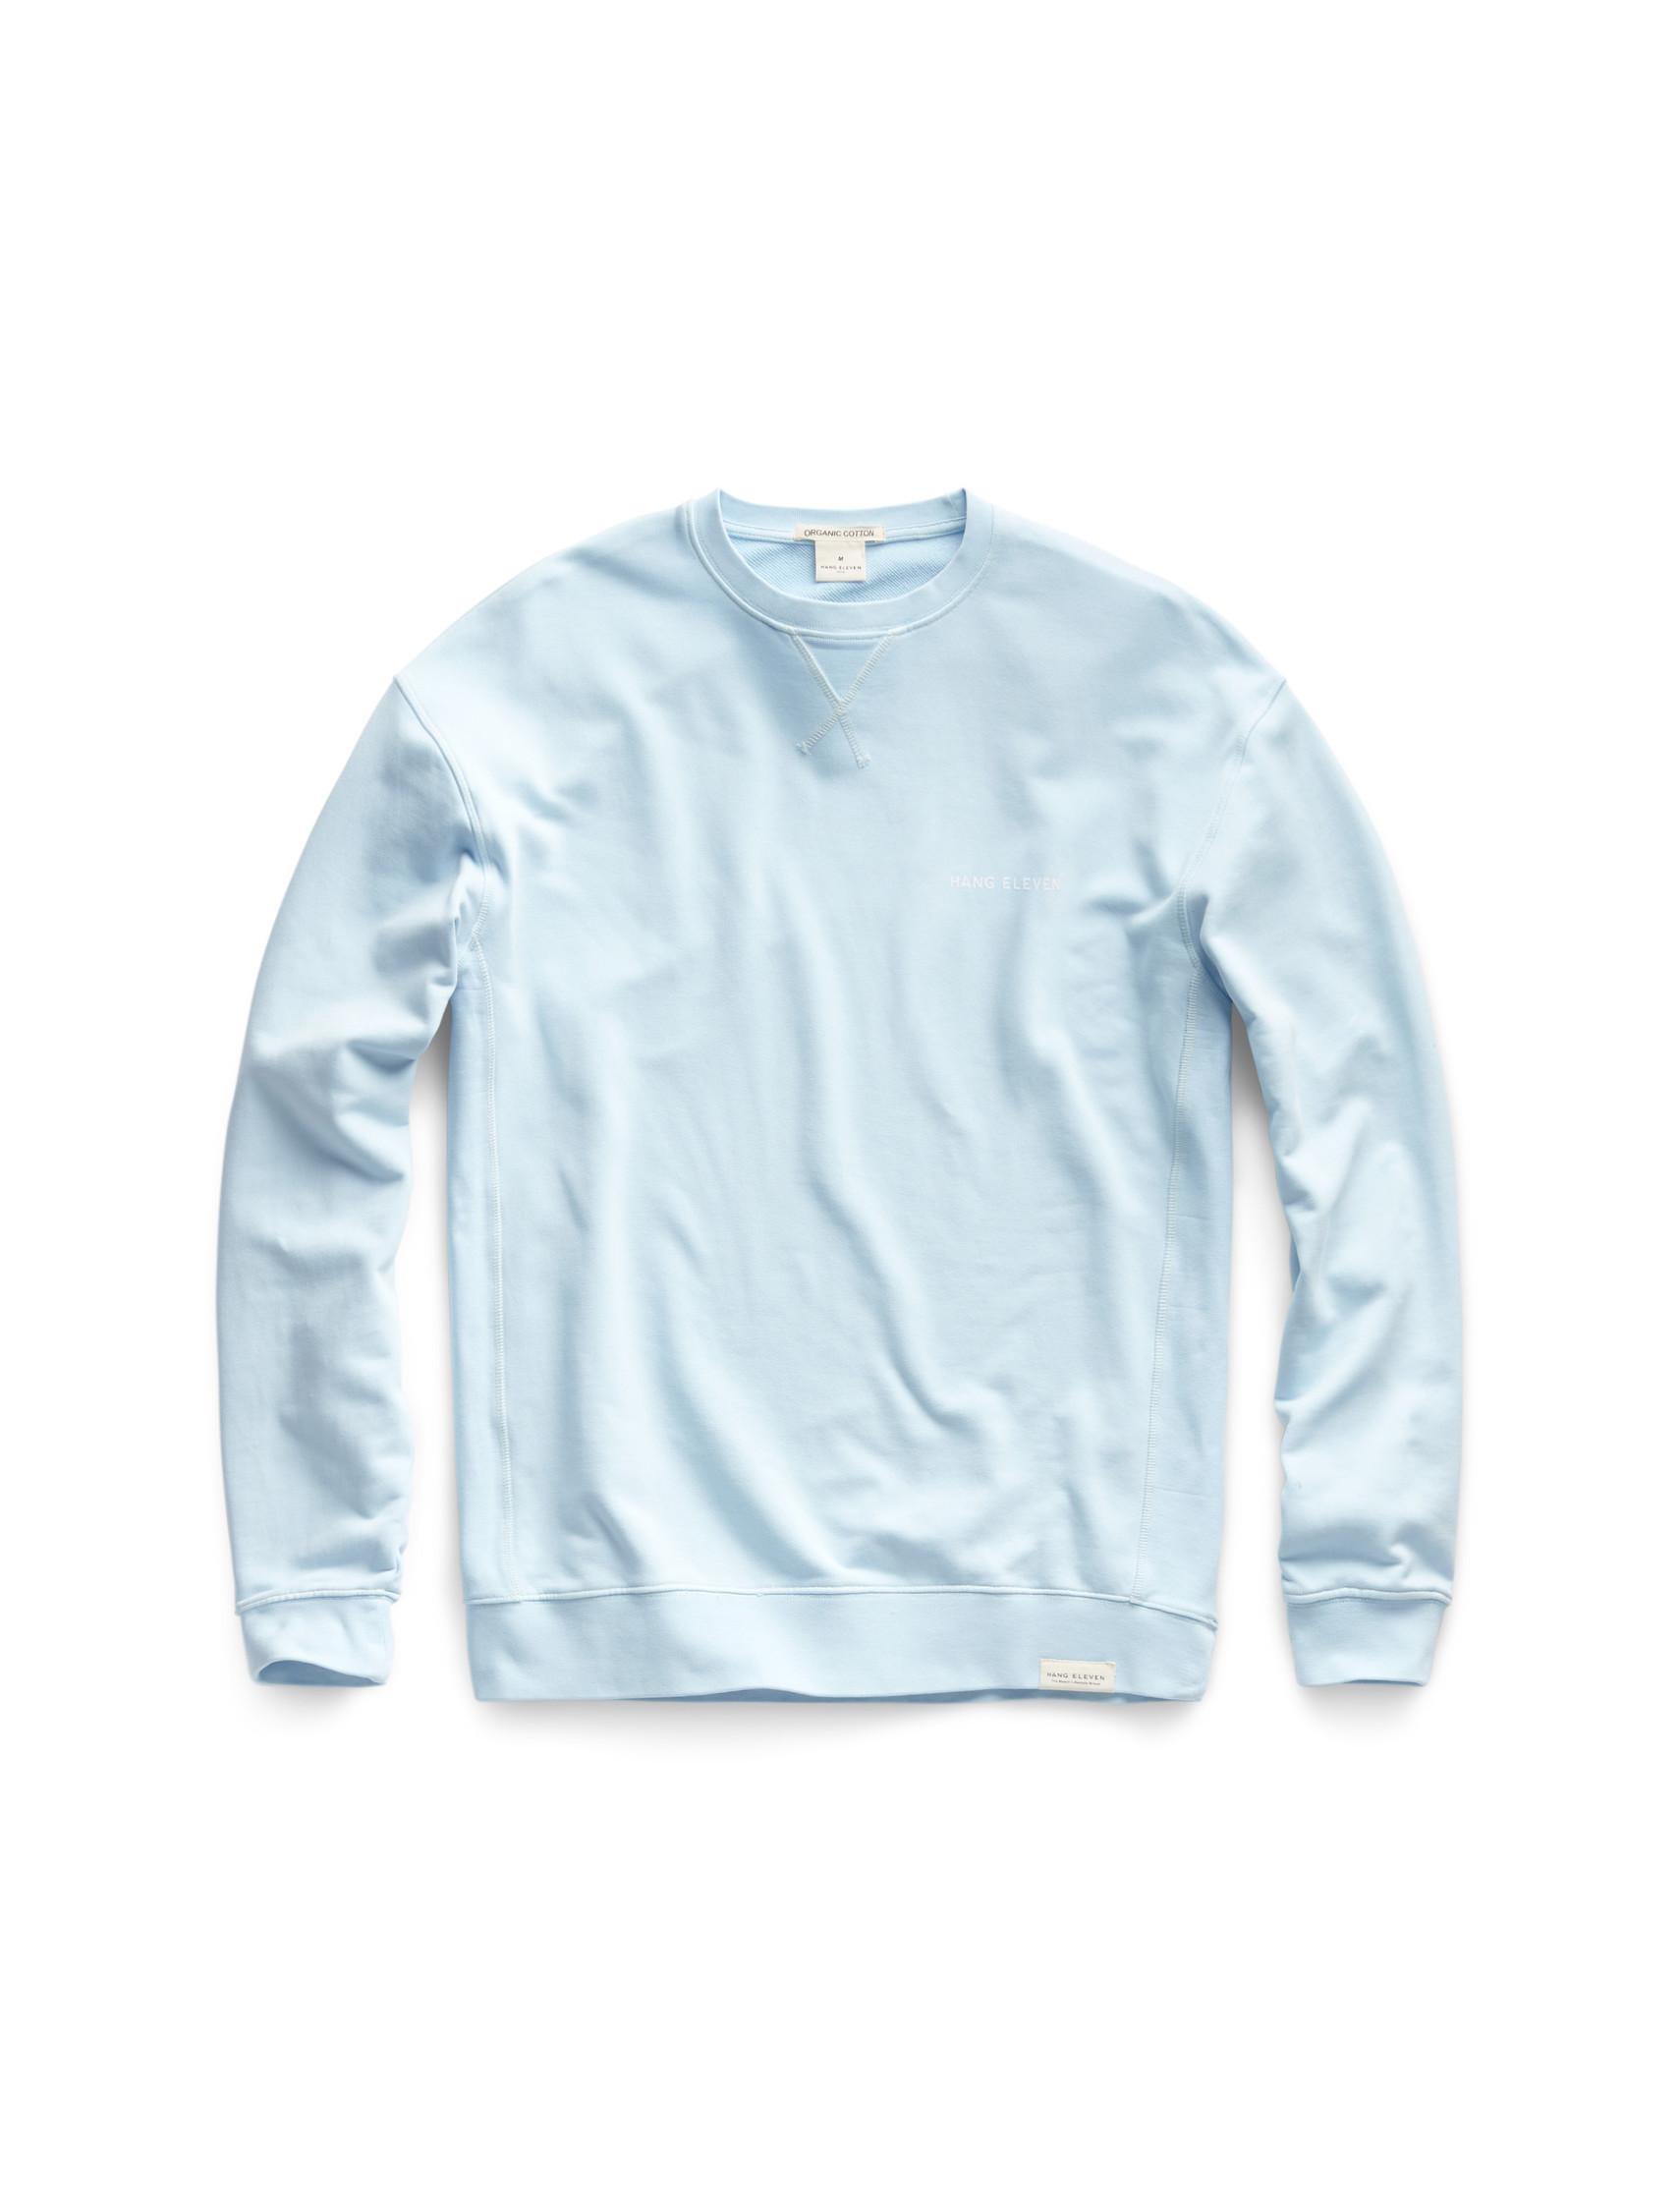 Lifestyle Crewneck - Light Blue